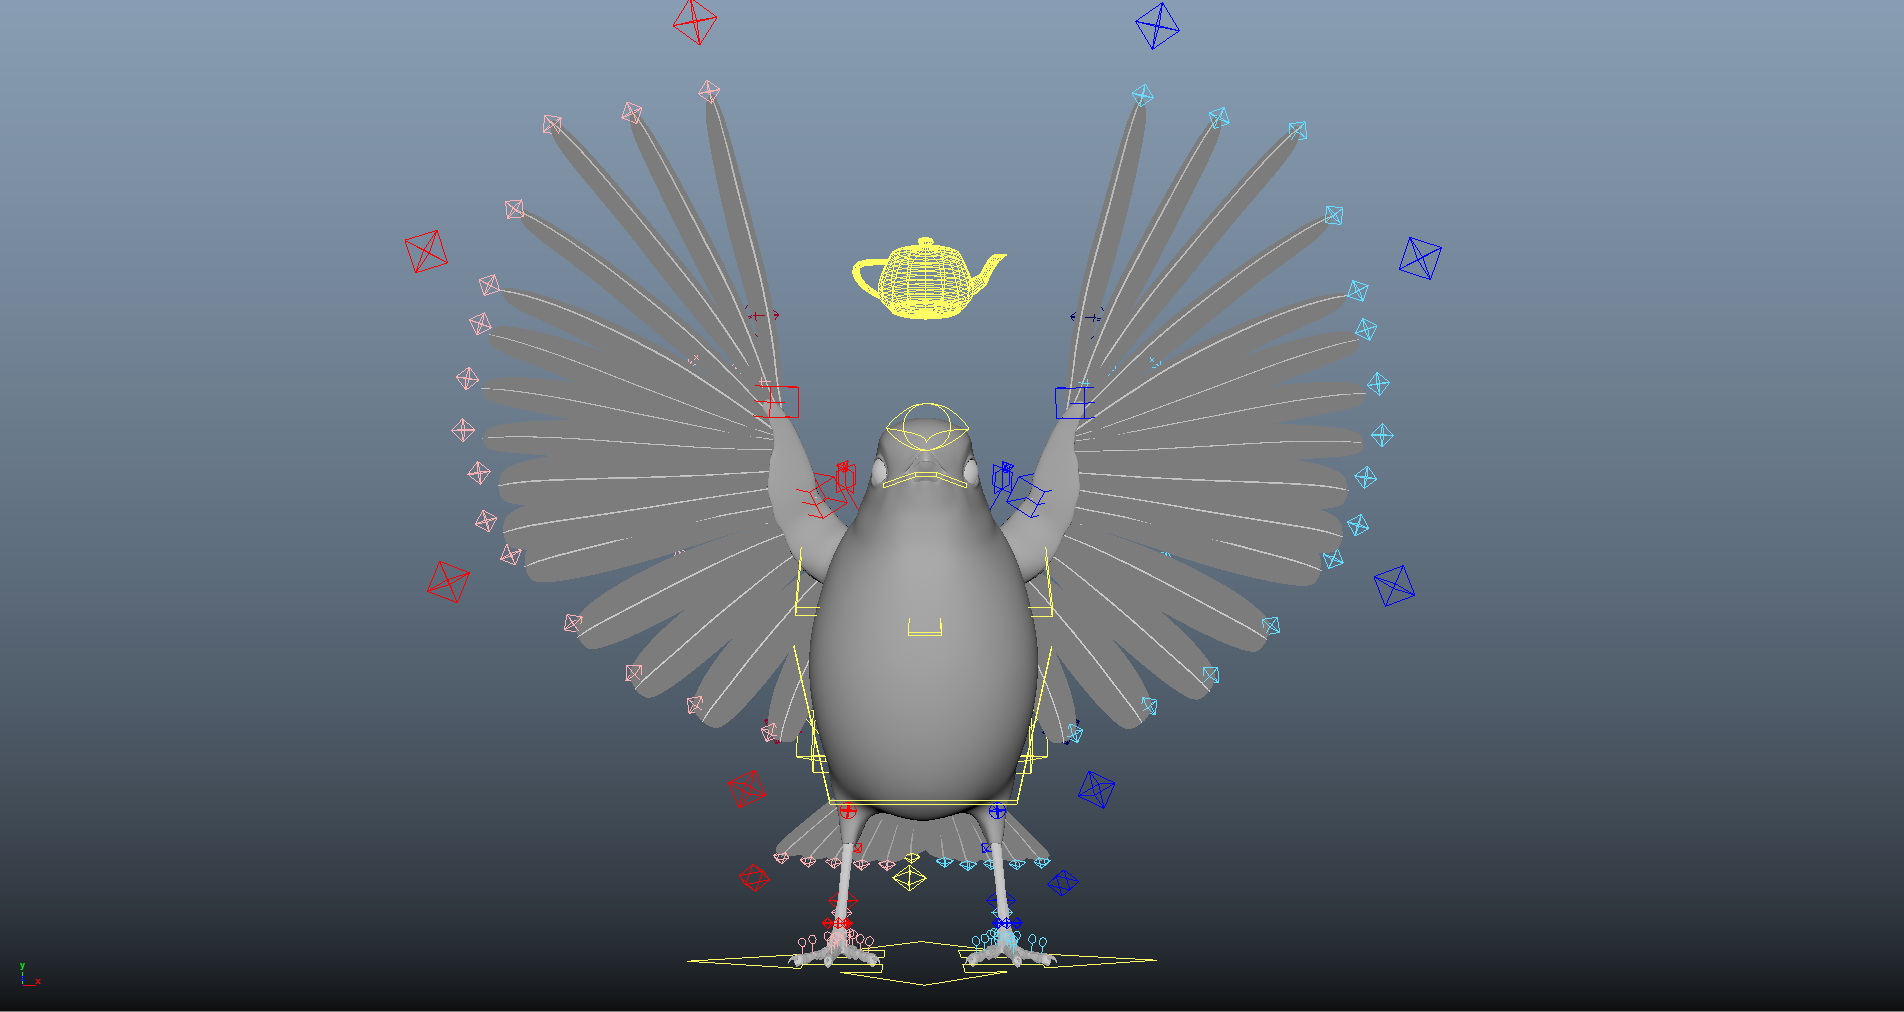 Bird Rig Controller Setup